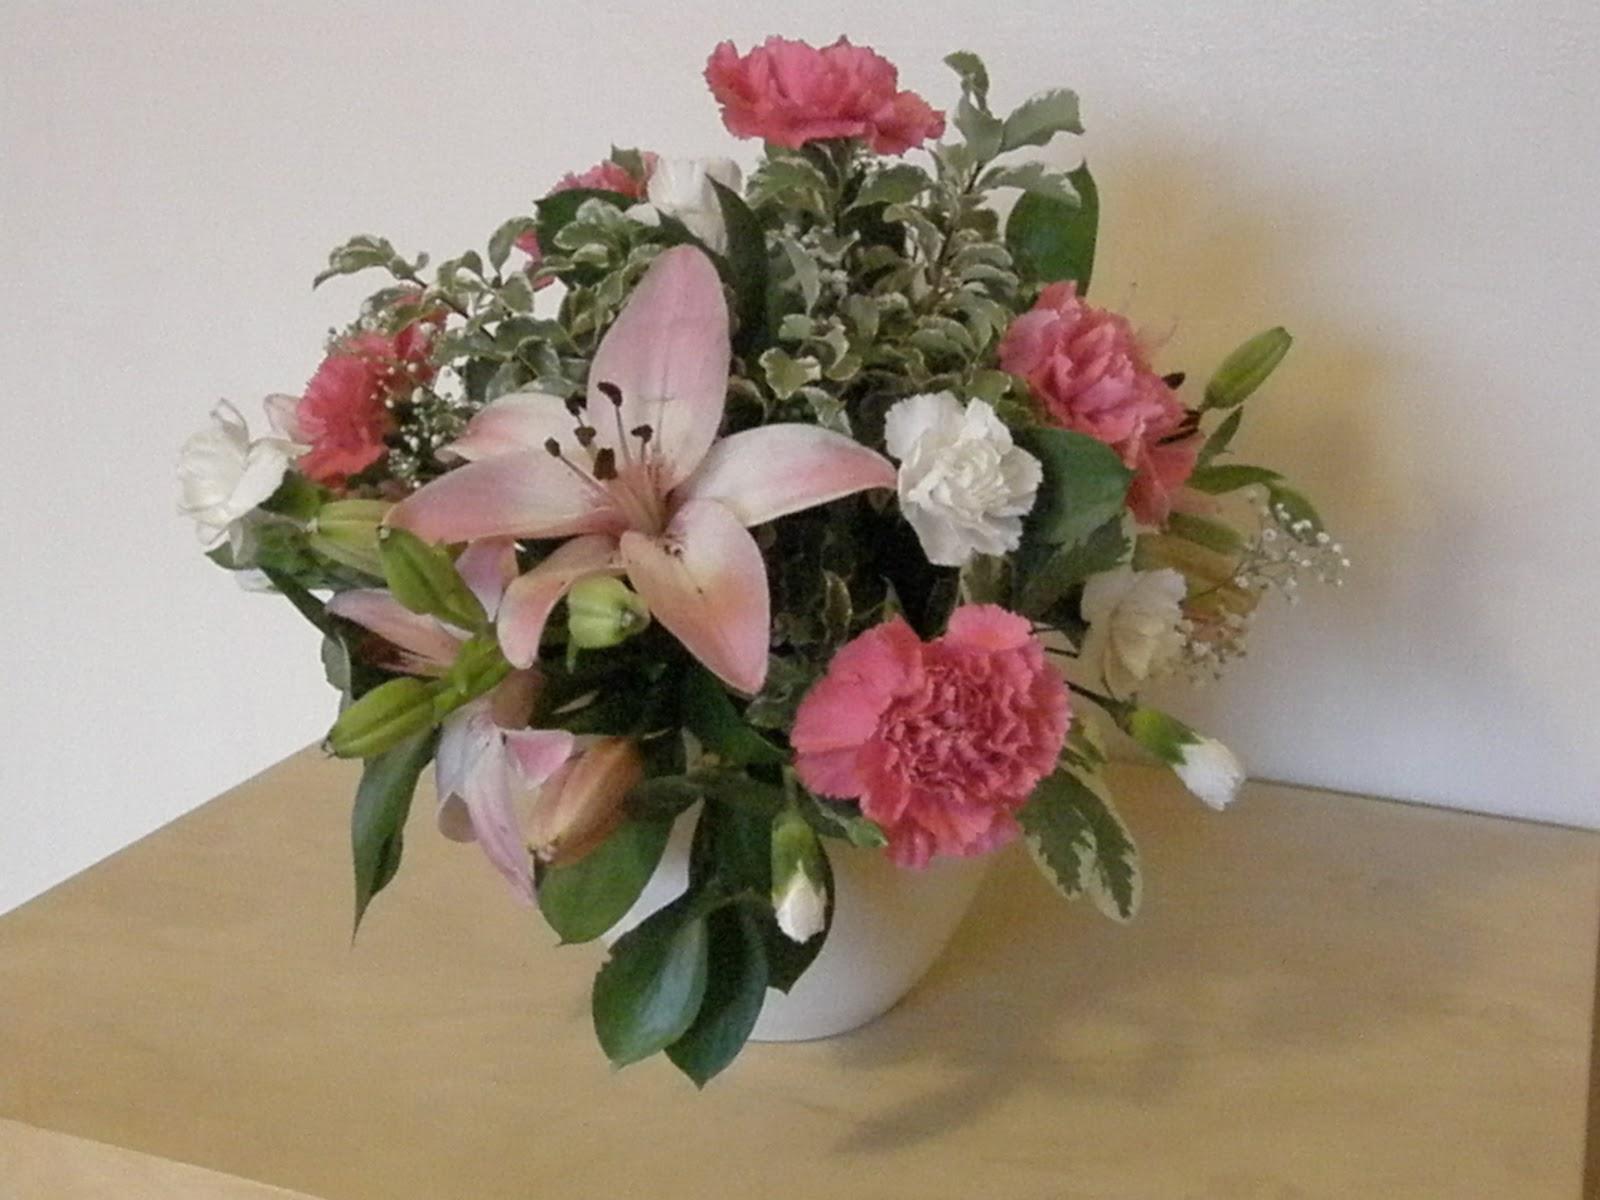 Sues family flowers and fun stuff a birthday flower arrangement 007g izmirmasajfo